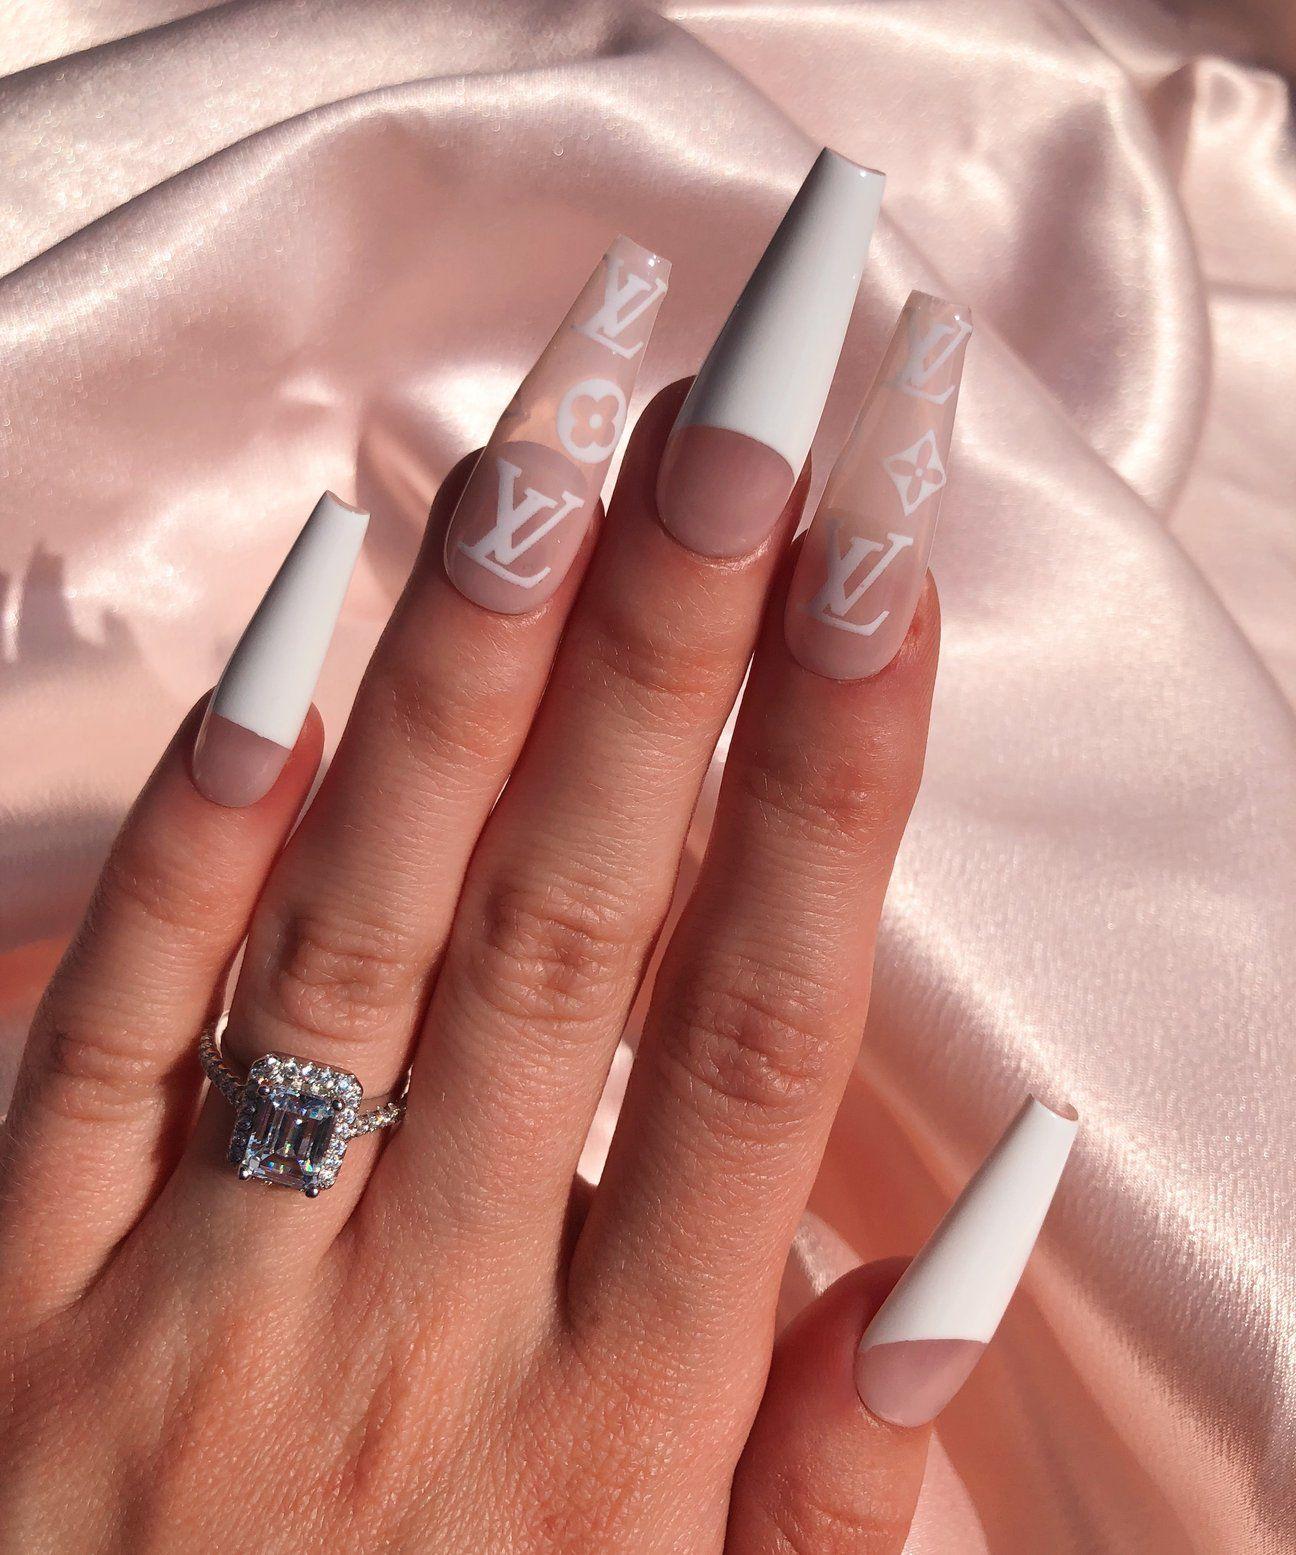 Keri S Nails Home Facebook